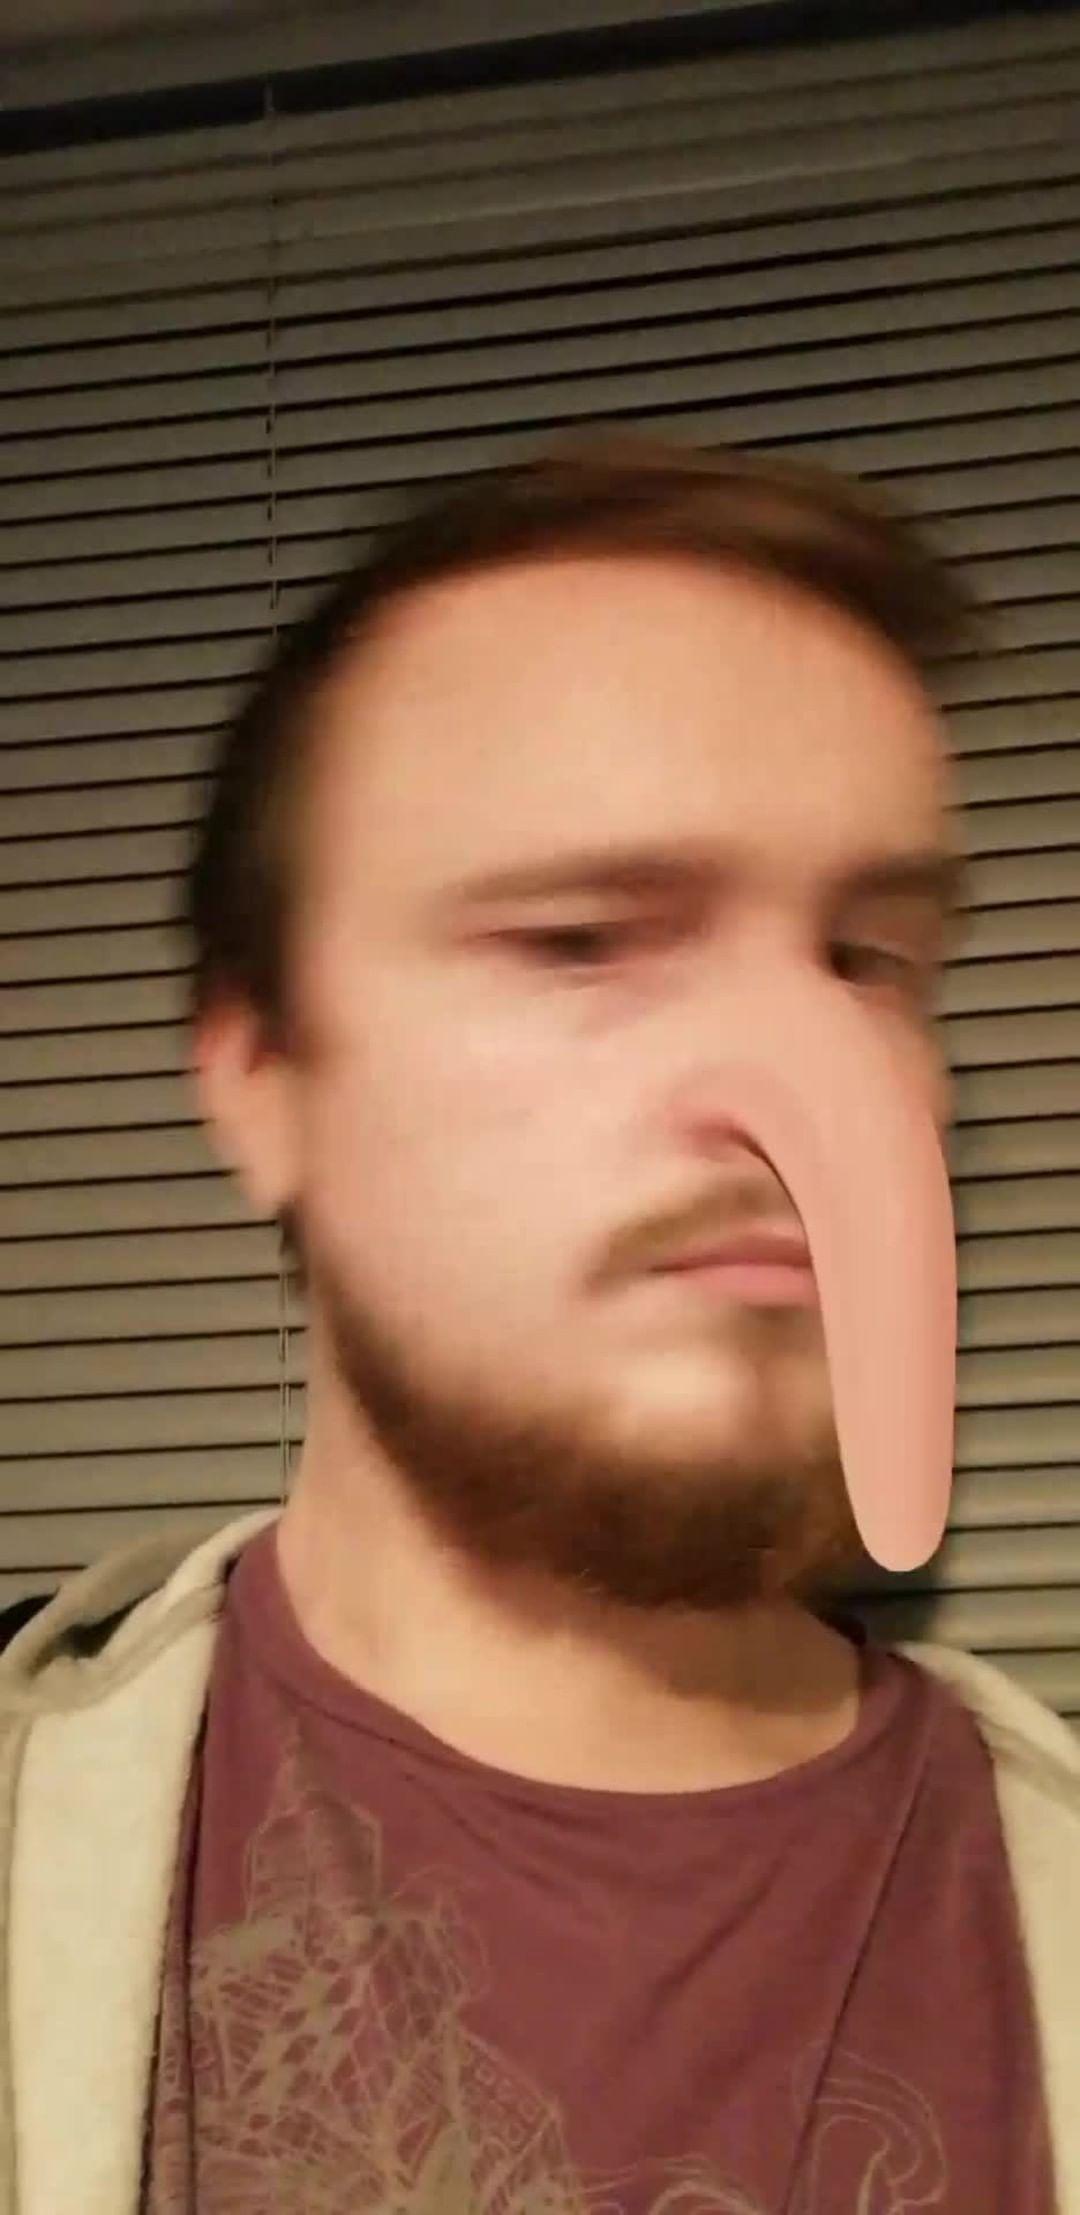 Instagram filter Floppy Nose